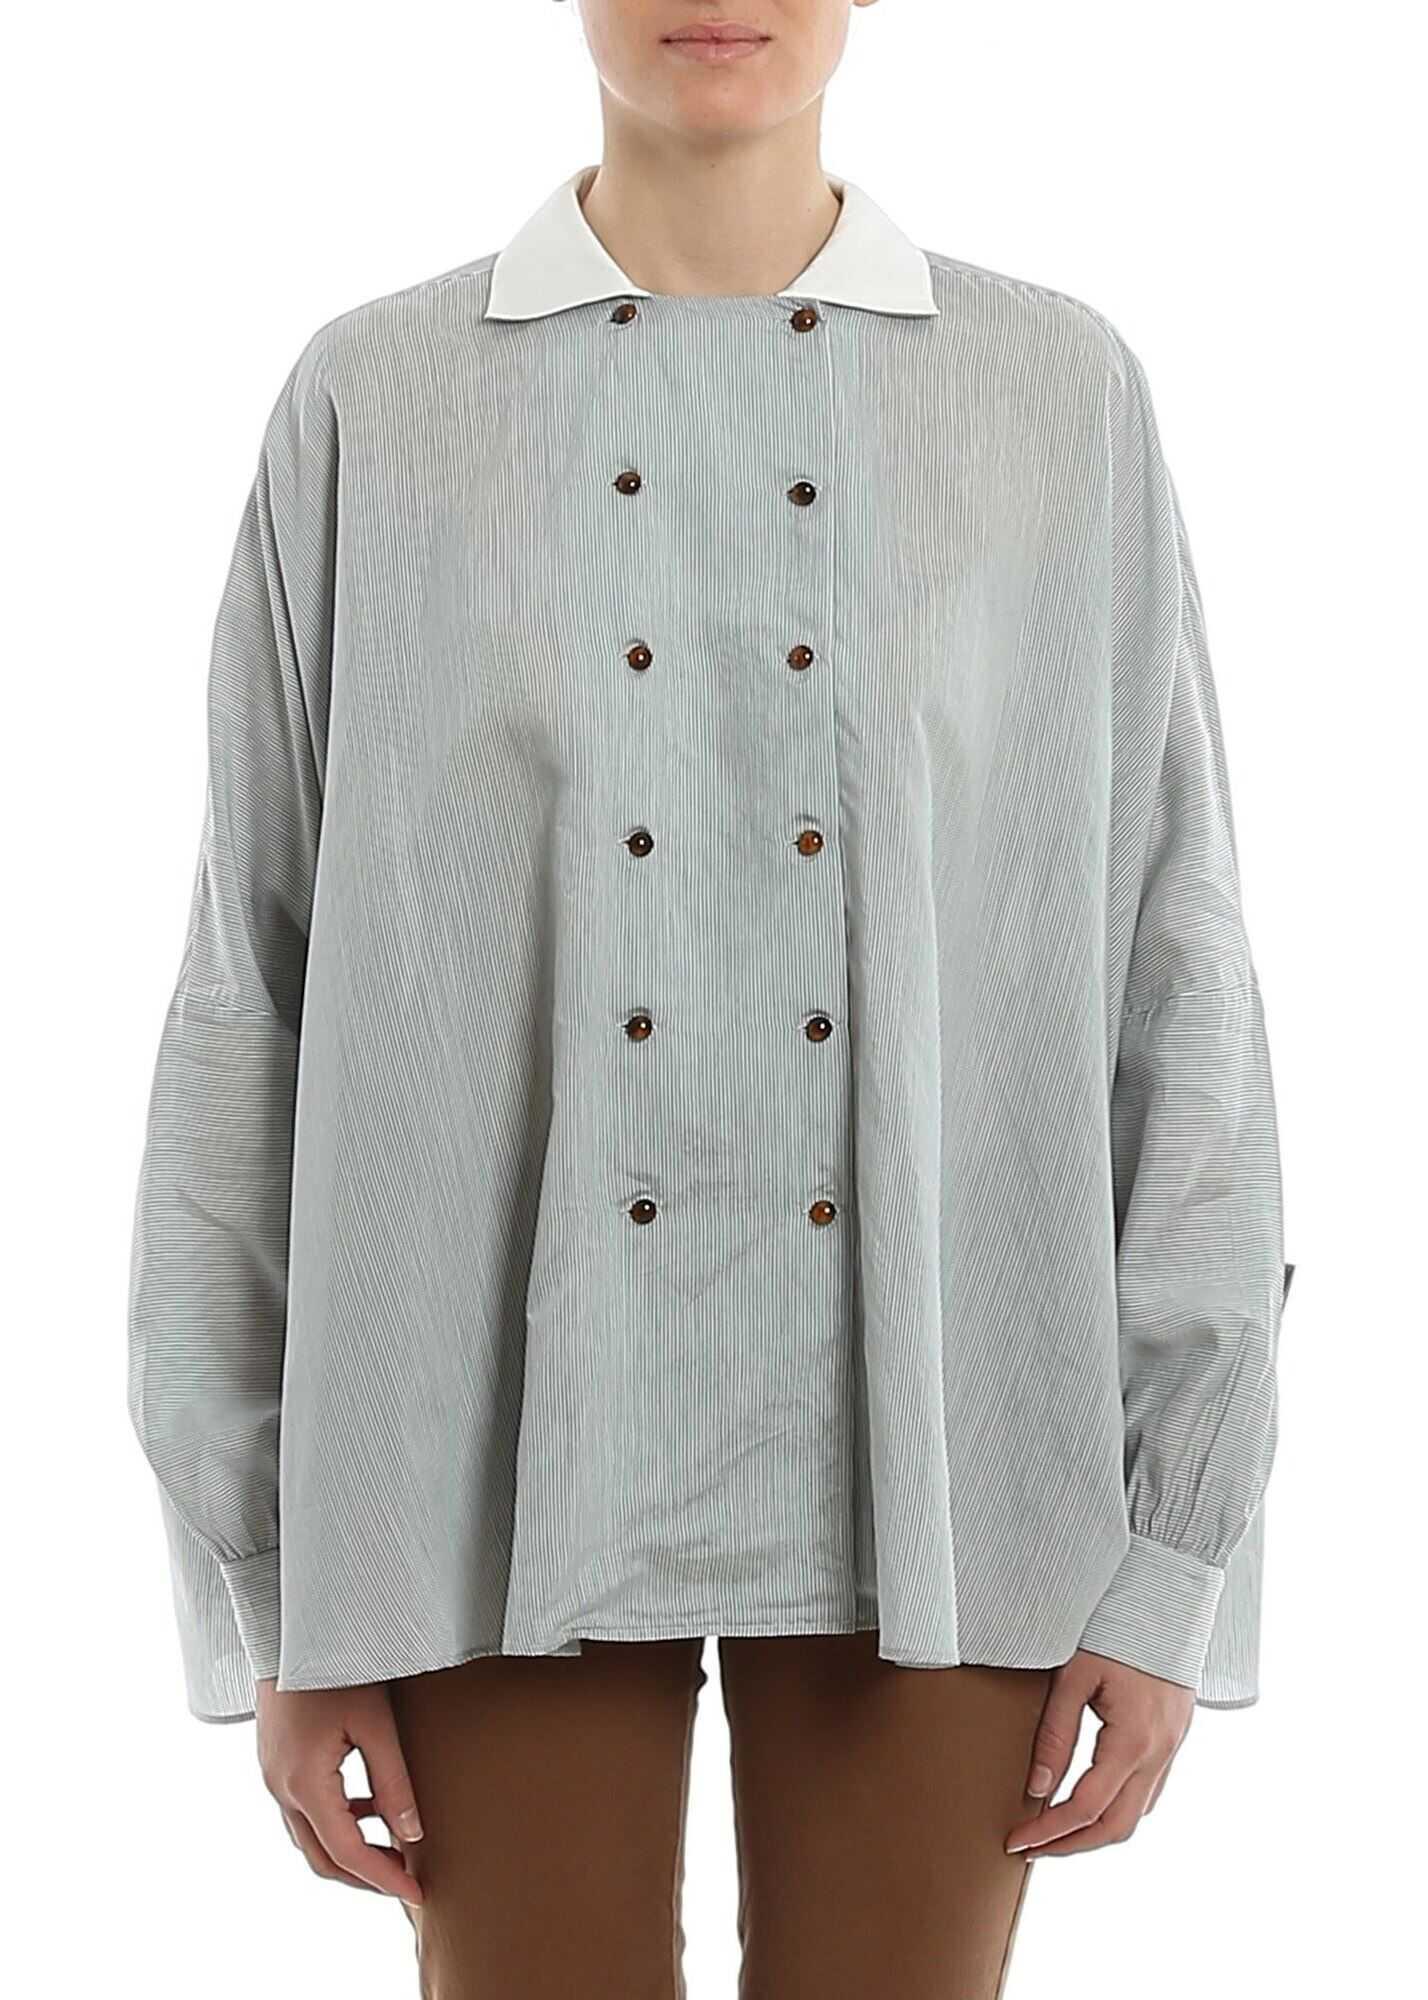 Giorgio Armani Striped Double Breasted Shirt Light Blue